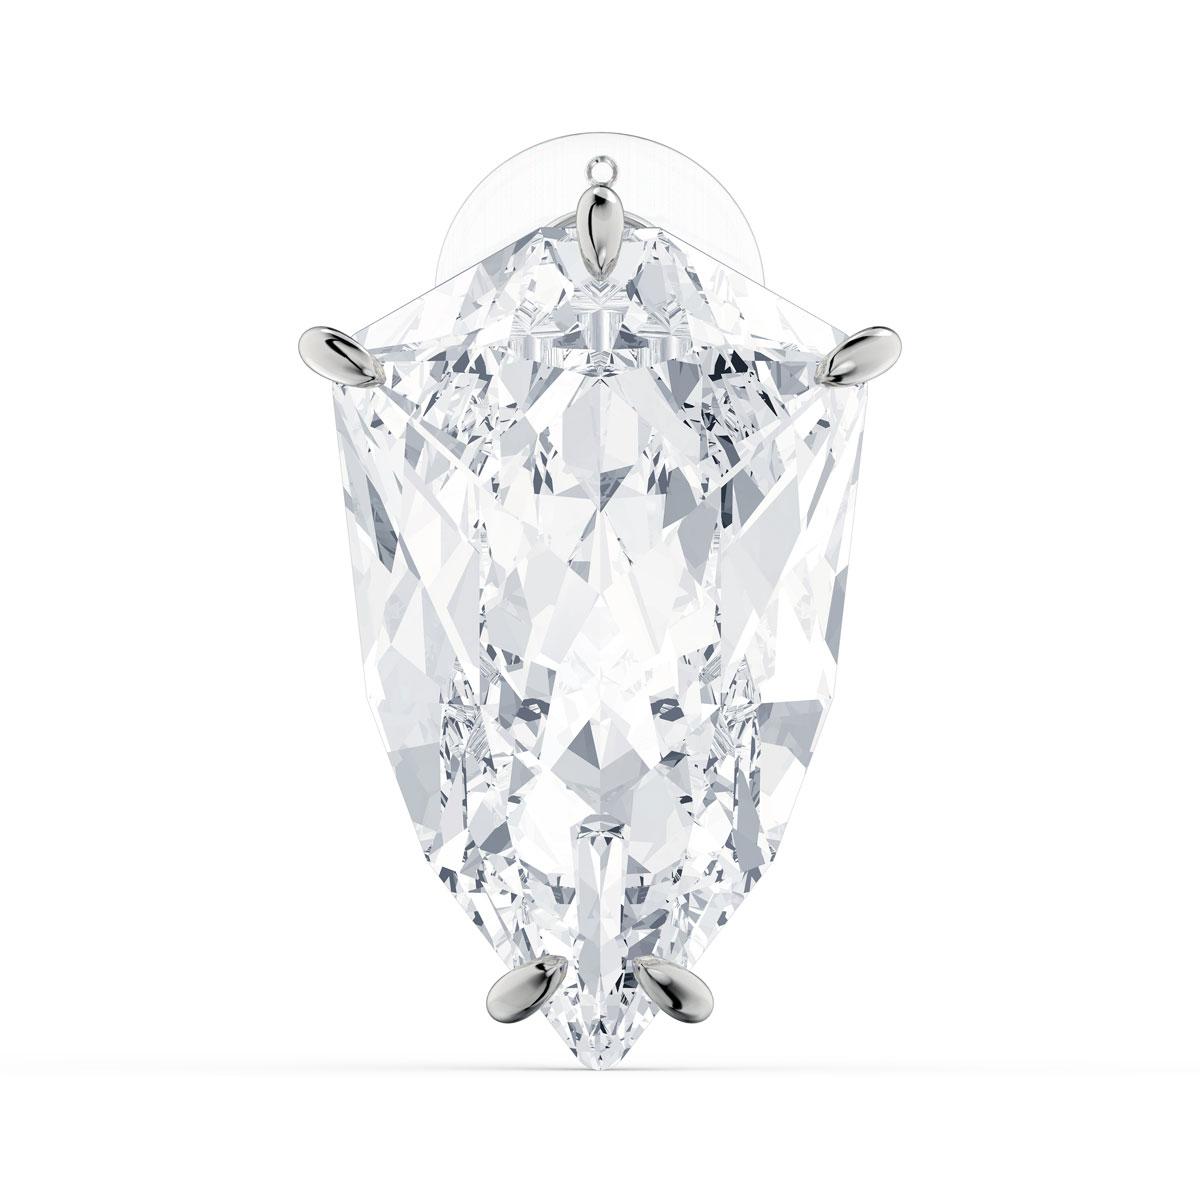 Swarovski Mesmera Earring, Single Trilliant Cut Crystal, White, Rhodium Plated